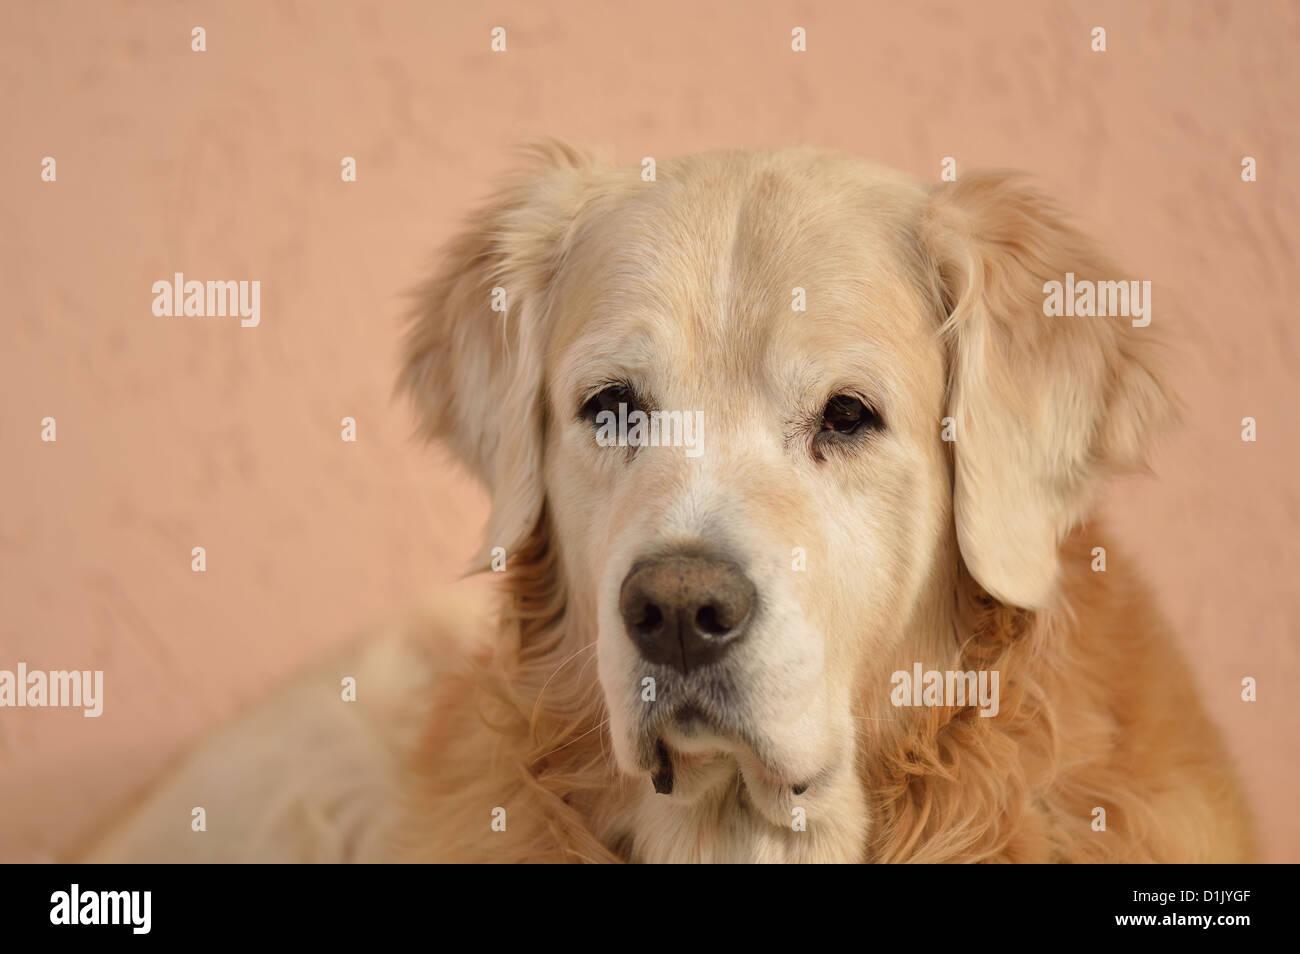 Portrait of Purebred Dog. Golden Retriever. Stock Photo - Stock Image